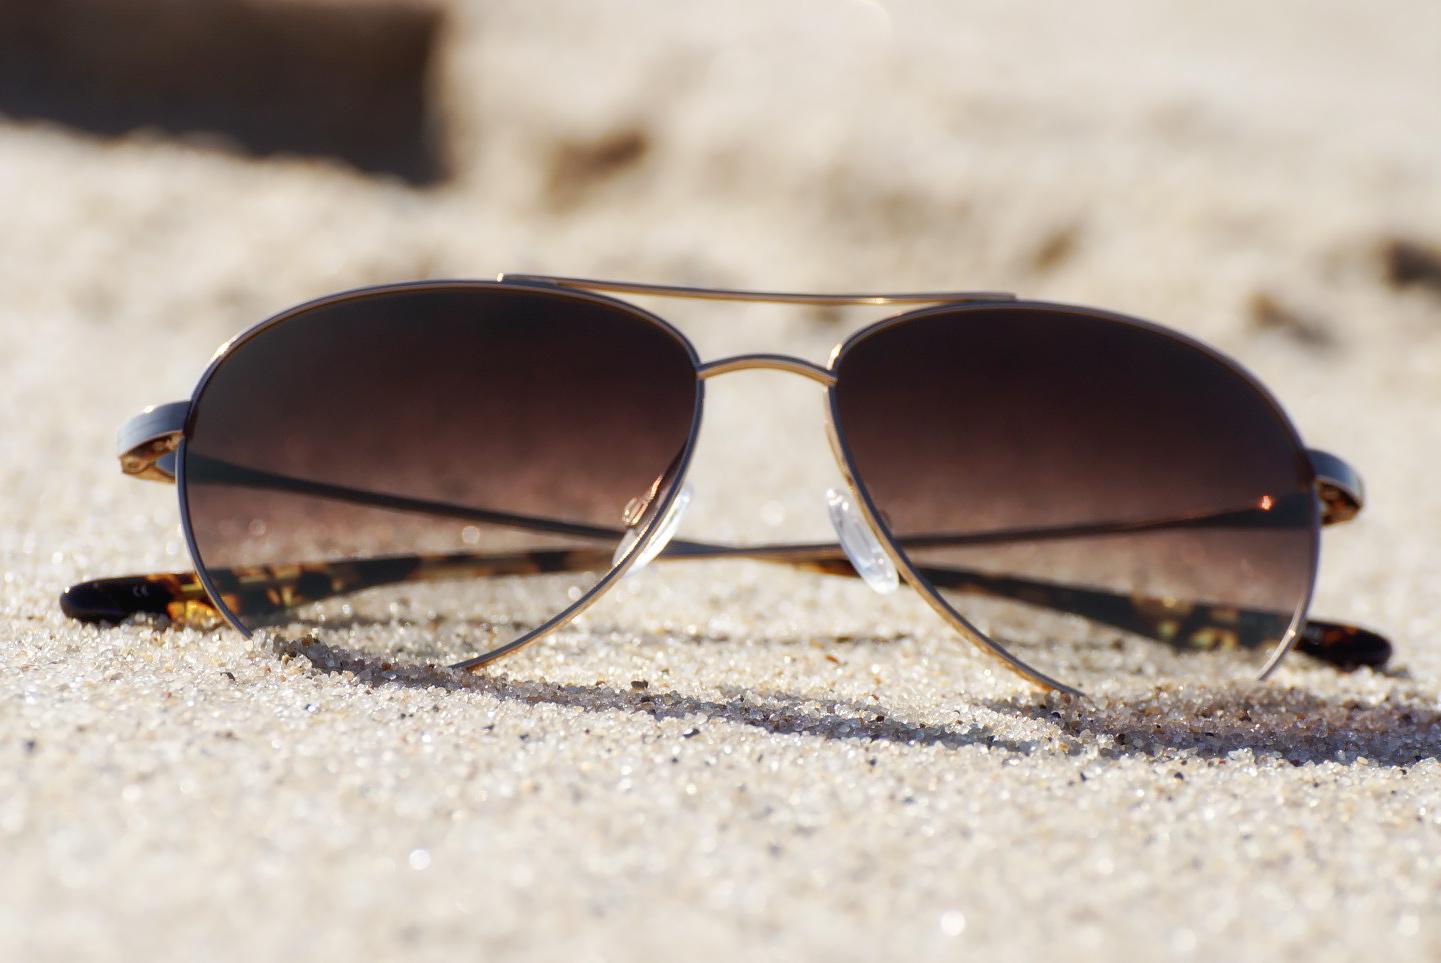 Barton Perreira Lovitt sunglasses pictured above.Image by  LocalPigeon